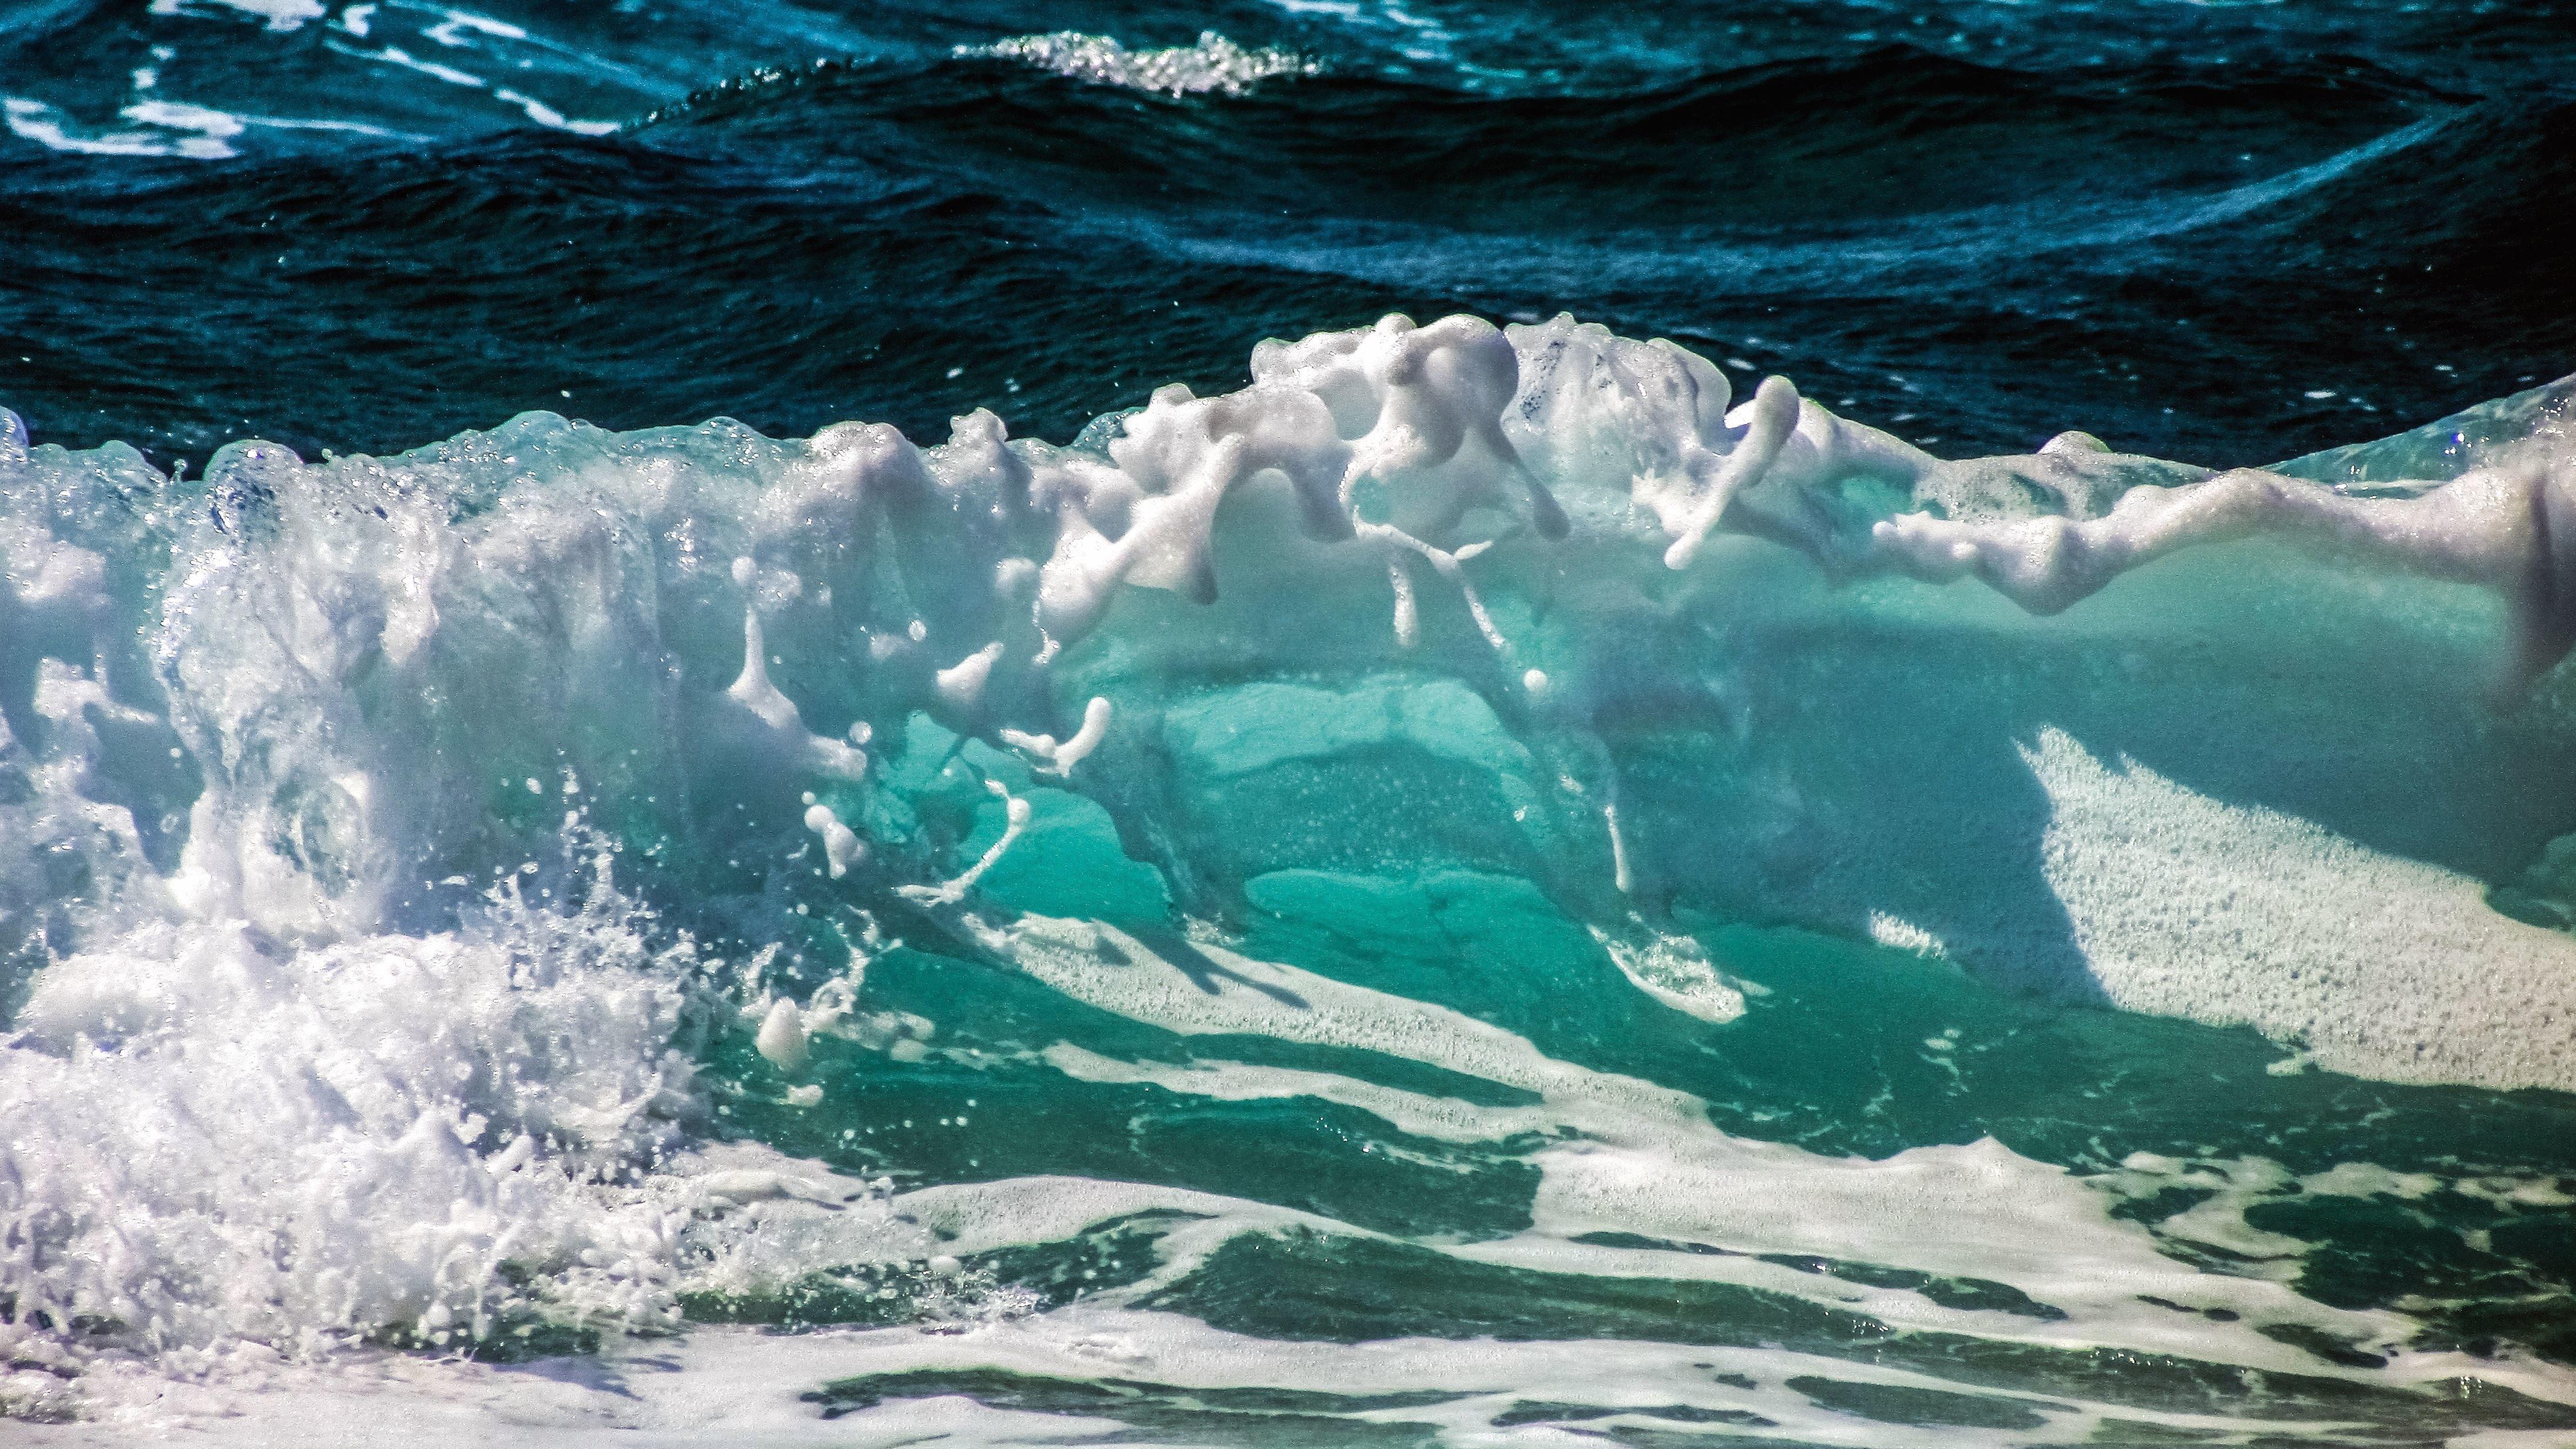 Drops Wallpaper Hd Free Picture Ocean Sea Splash Water Wave